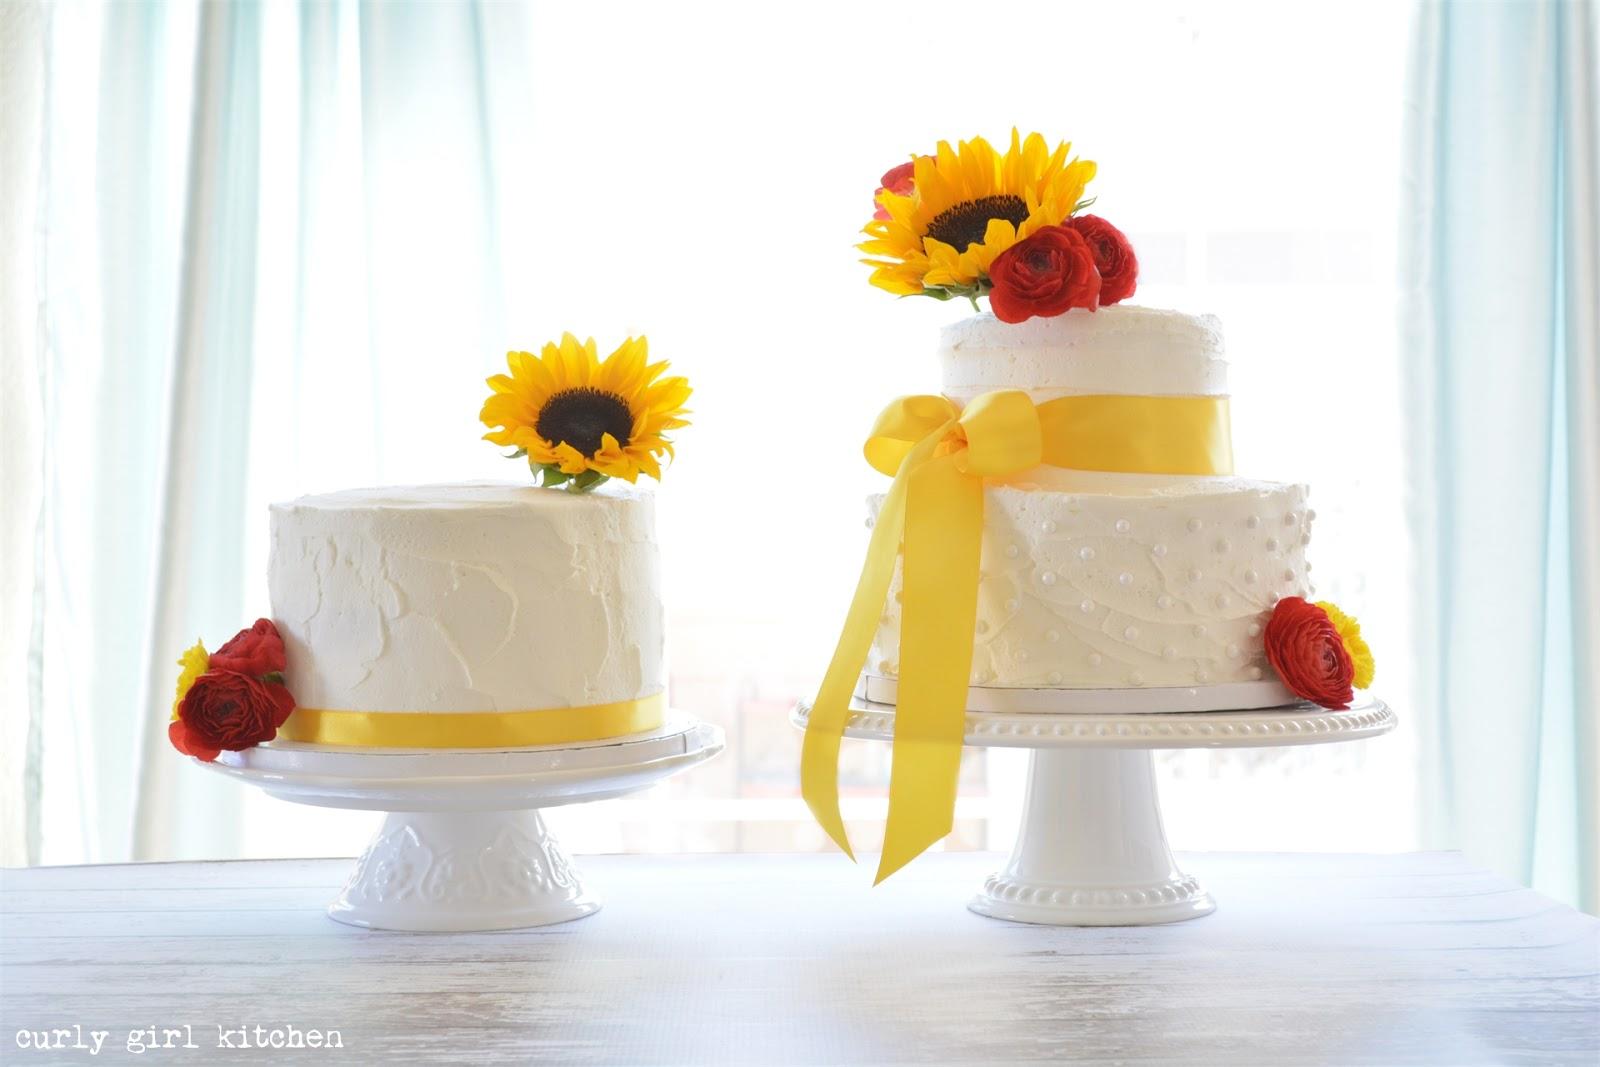 Curly Girl Kitchen: Sunflower Wedding Cakes